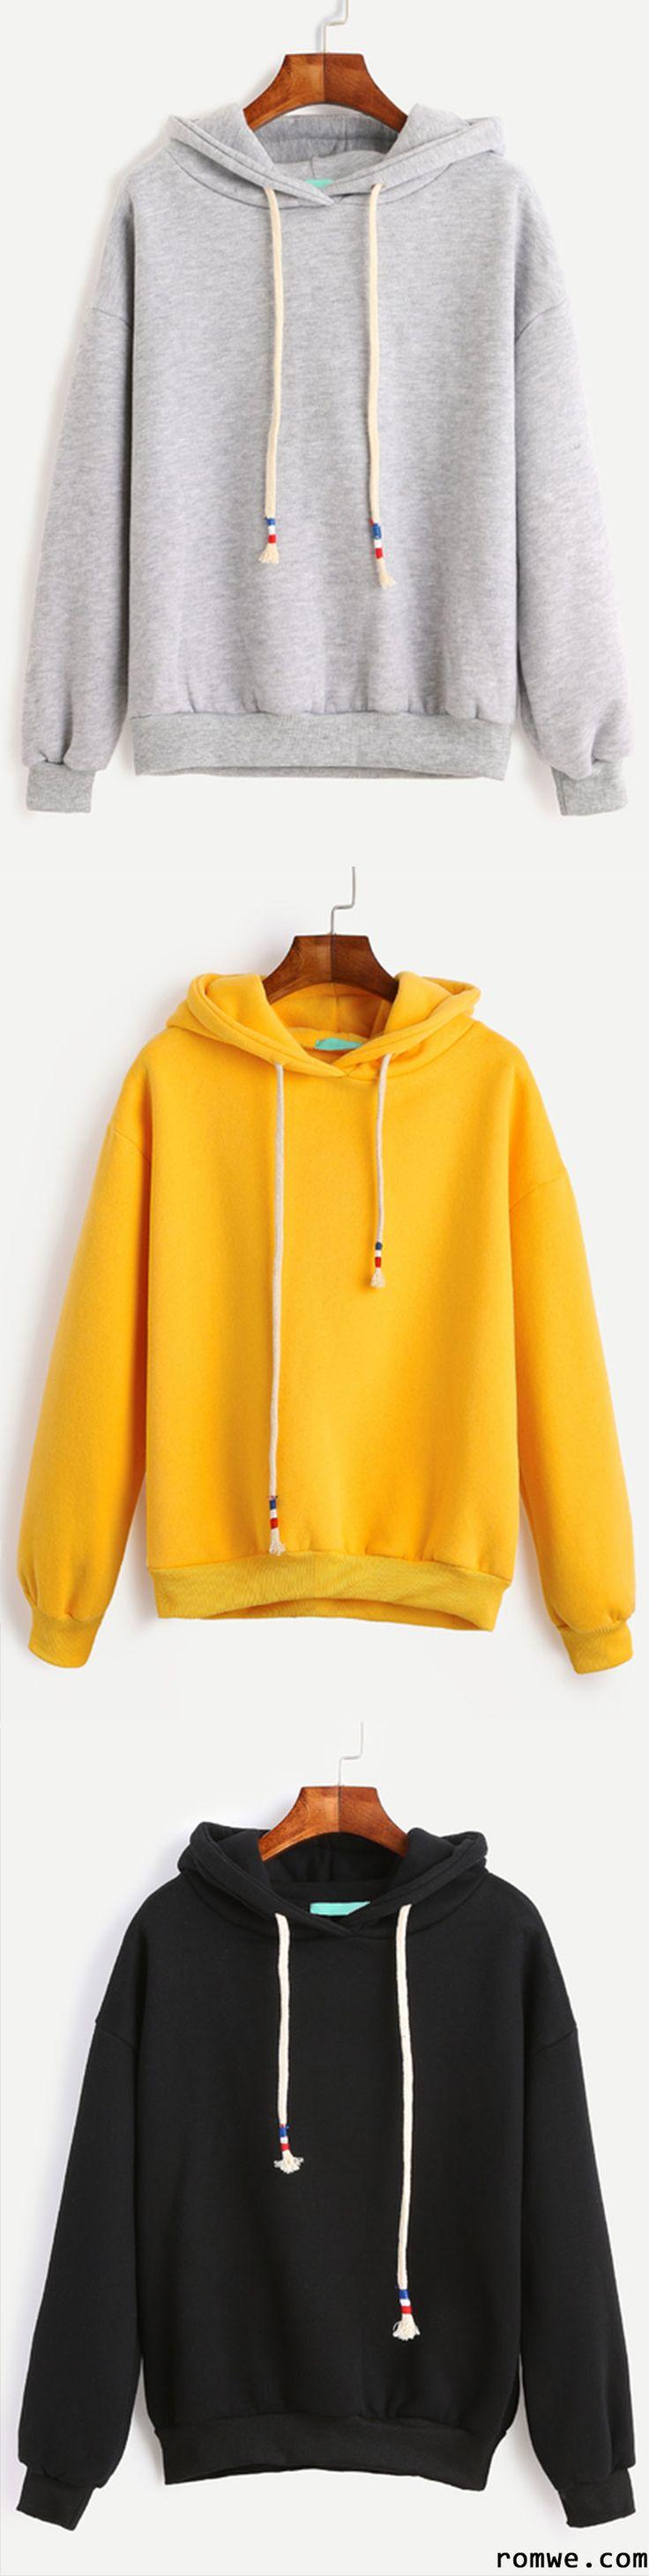 Grey Drop Shoulder Drawstring Hooded Sweatshirt